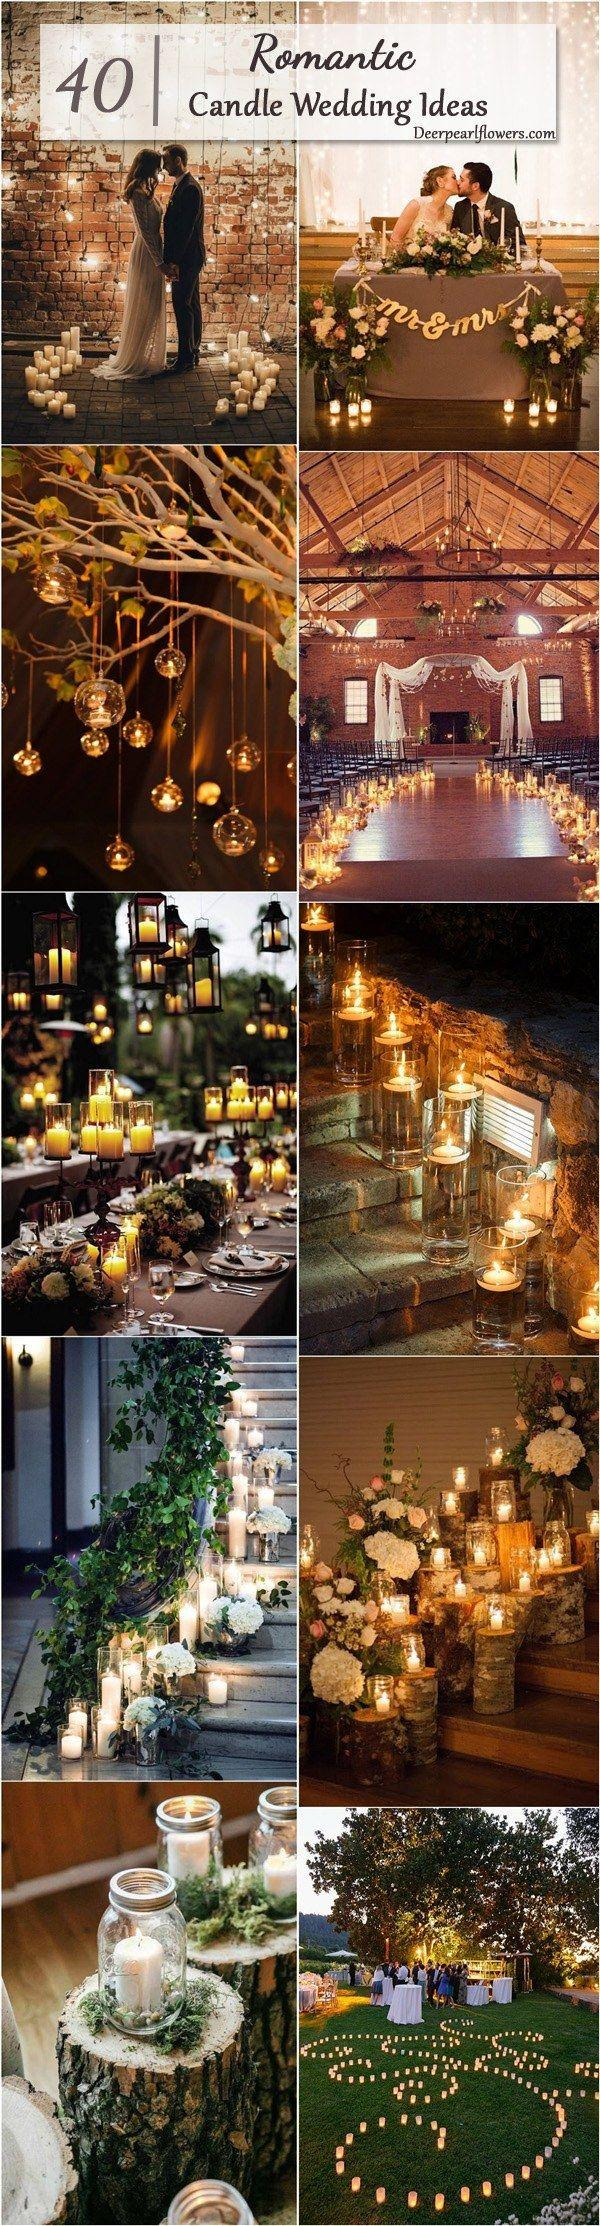 Свадьба - 40 Chic Romantic Wedding Ideas Using Candles